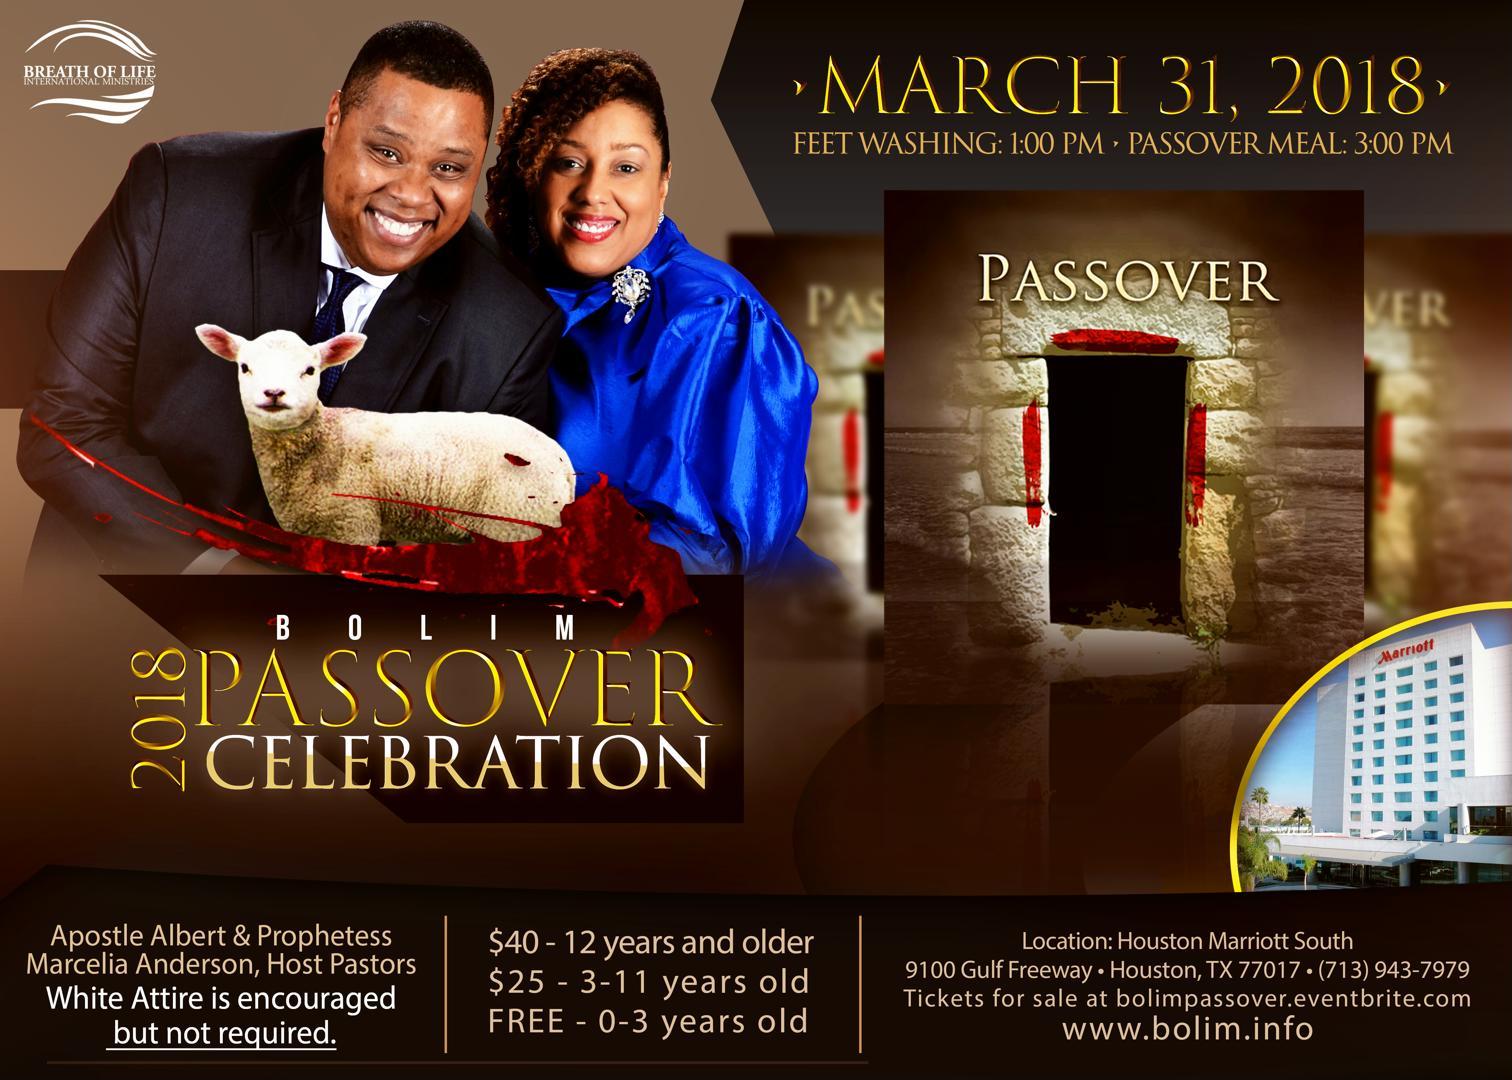 BOLIM Passover 2018